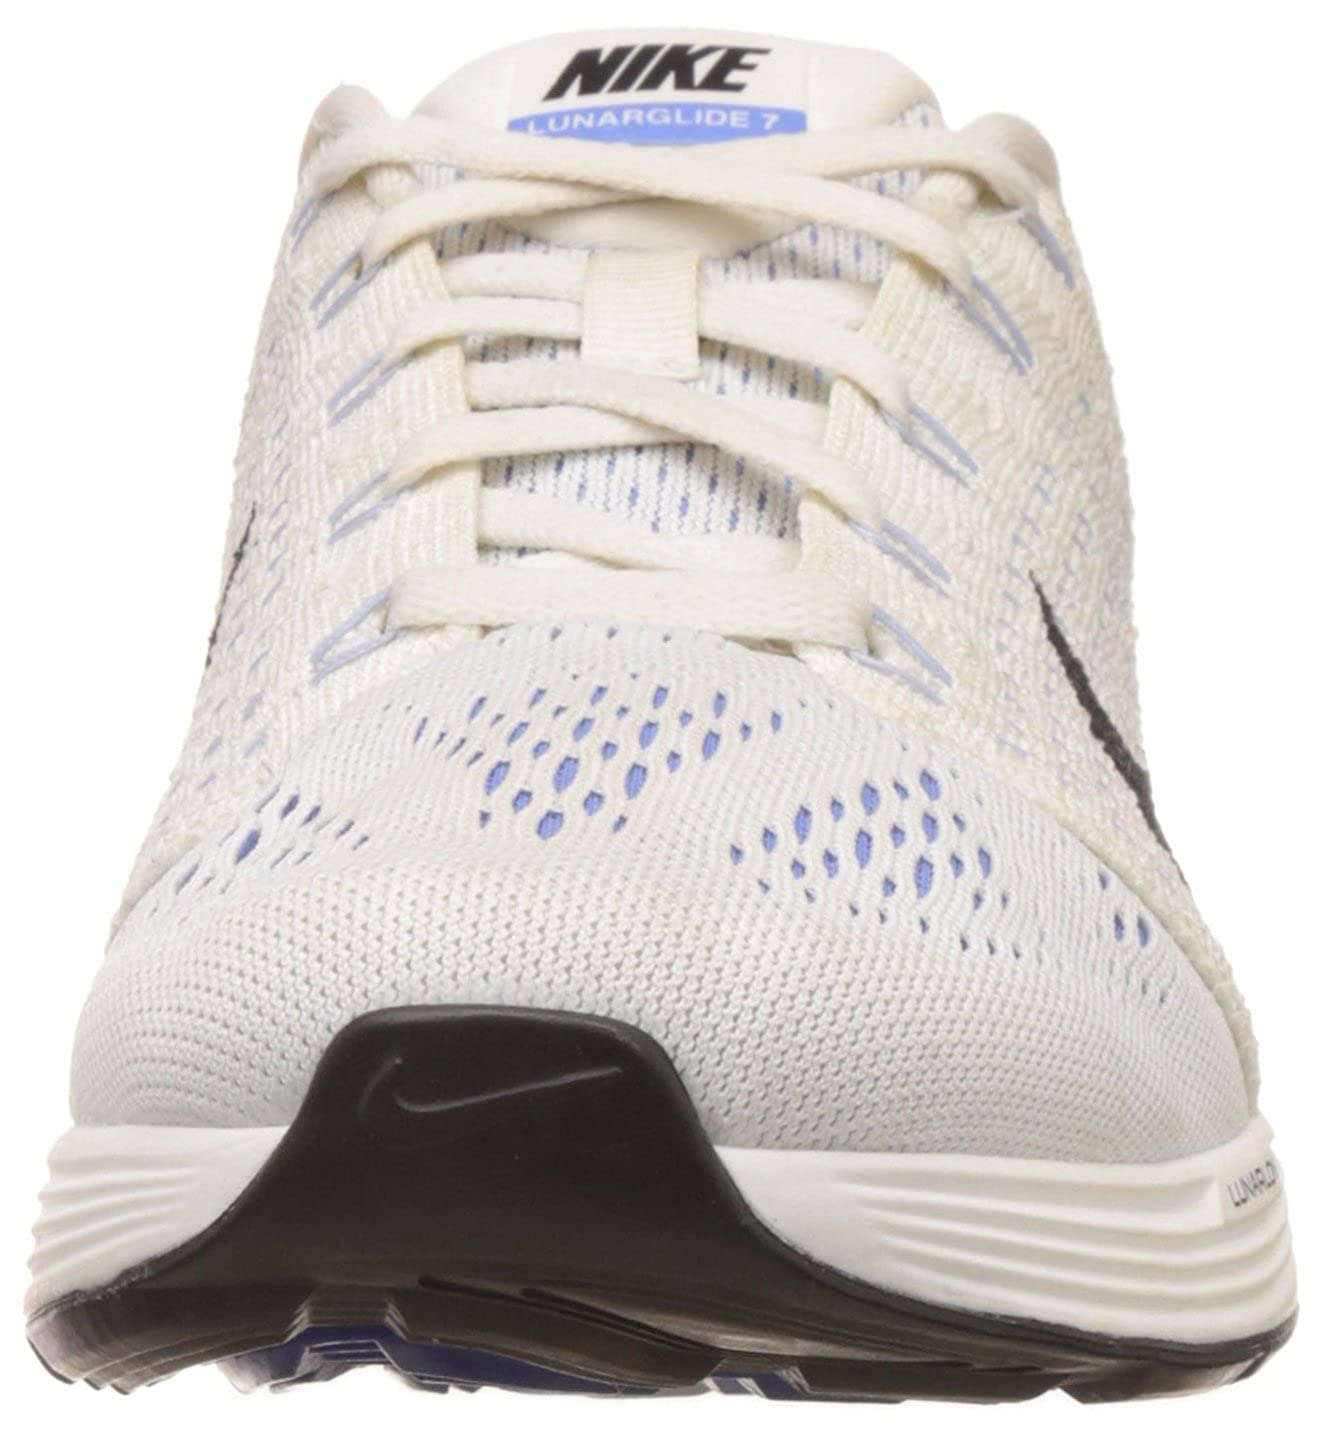 hot sale online 43e1c 86018 ... germany amazon nike womens lunarglide 7 running shoe running 3c6d3 fe0b1